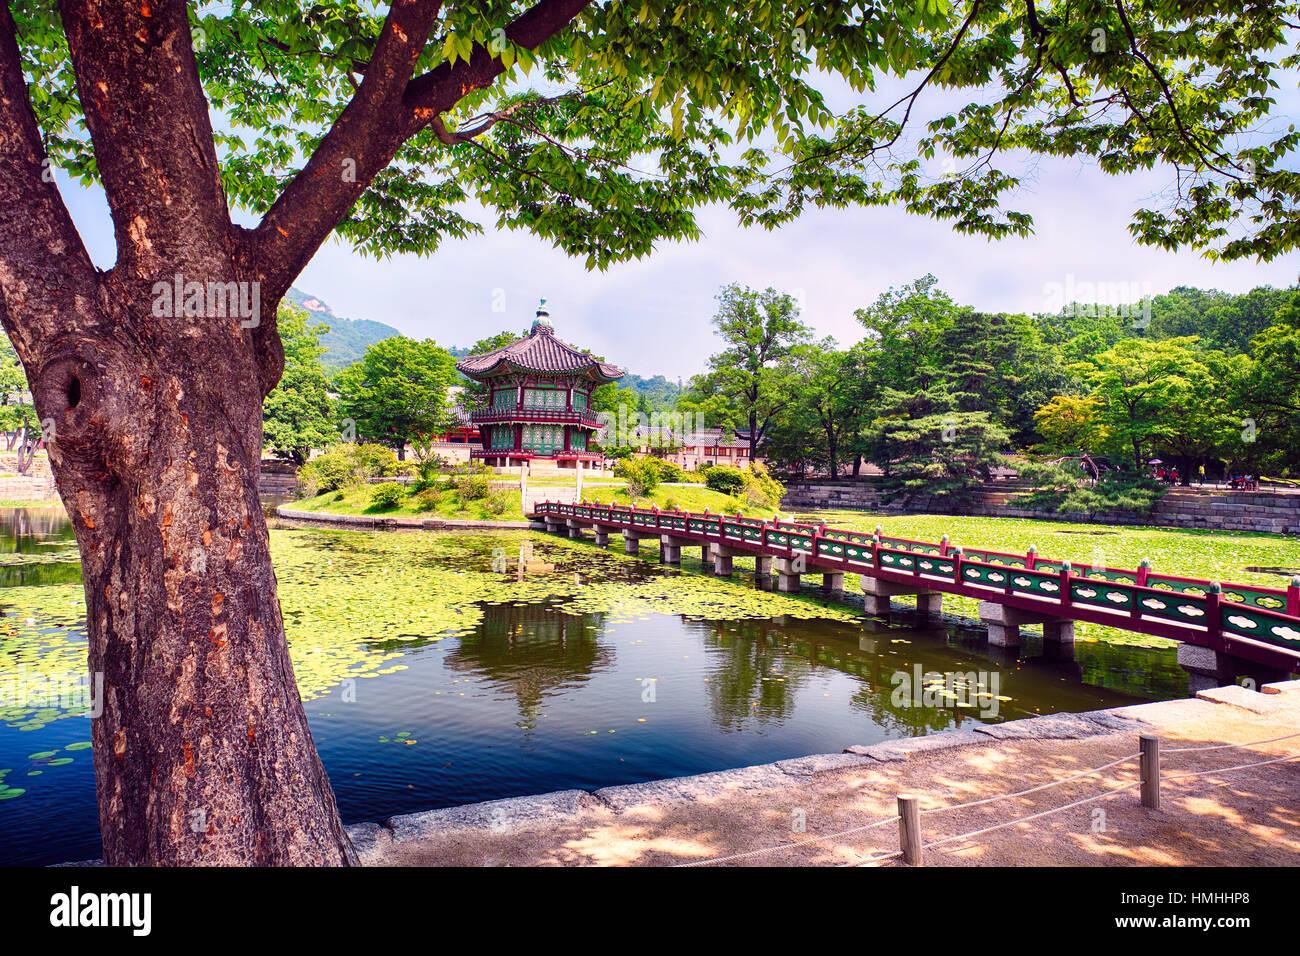 Footbridge Leading to the Pavilion of Far-Reaching Fragrance, Gyeongbokgung Palace; Seoul, South Korea - Stock Image